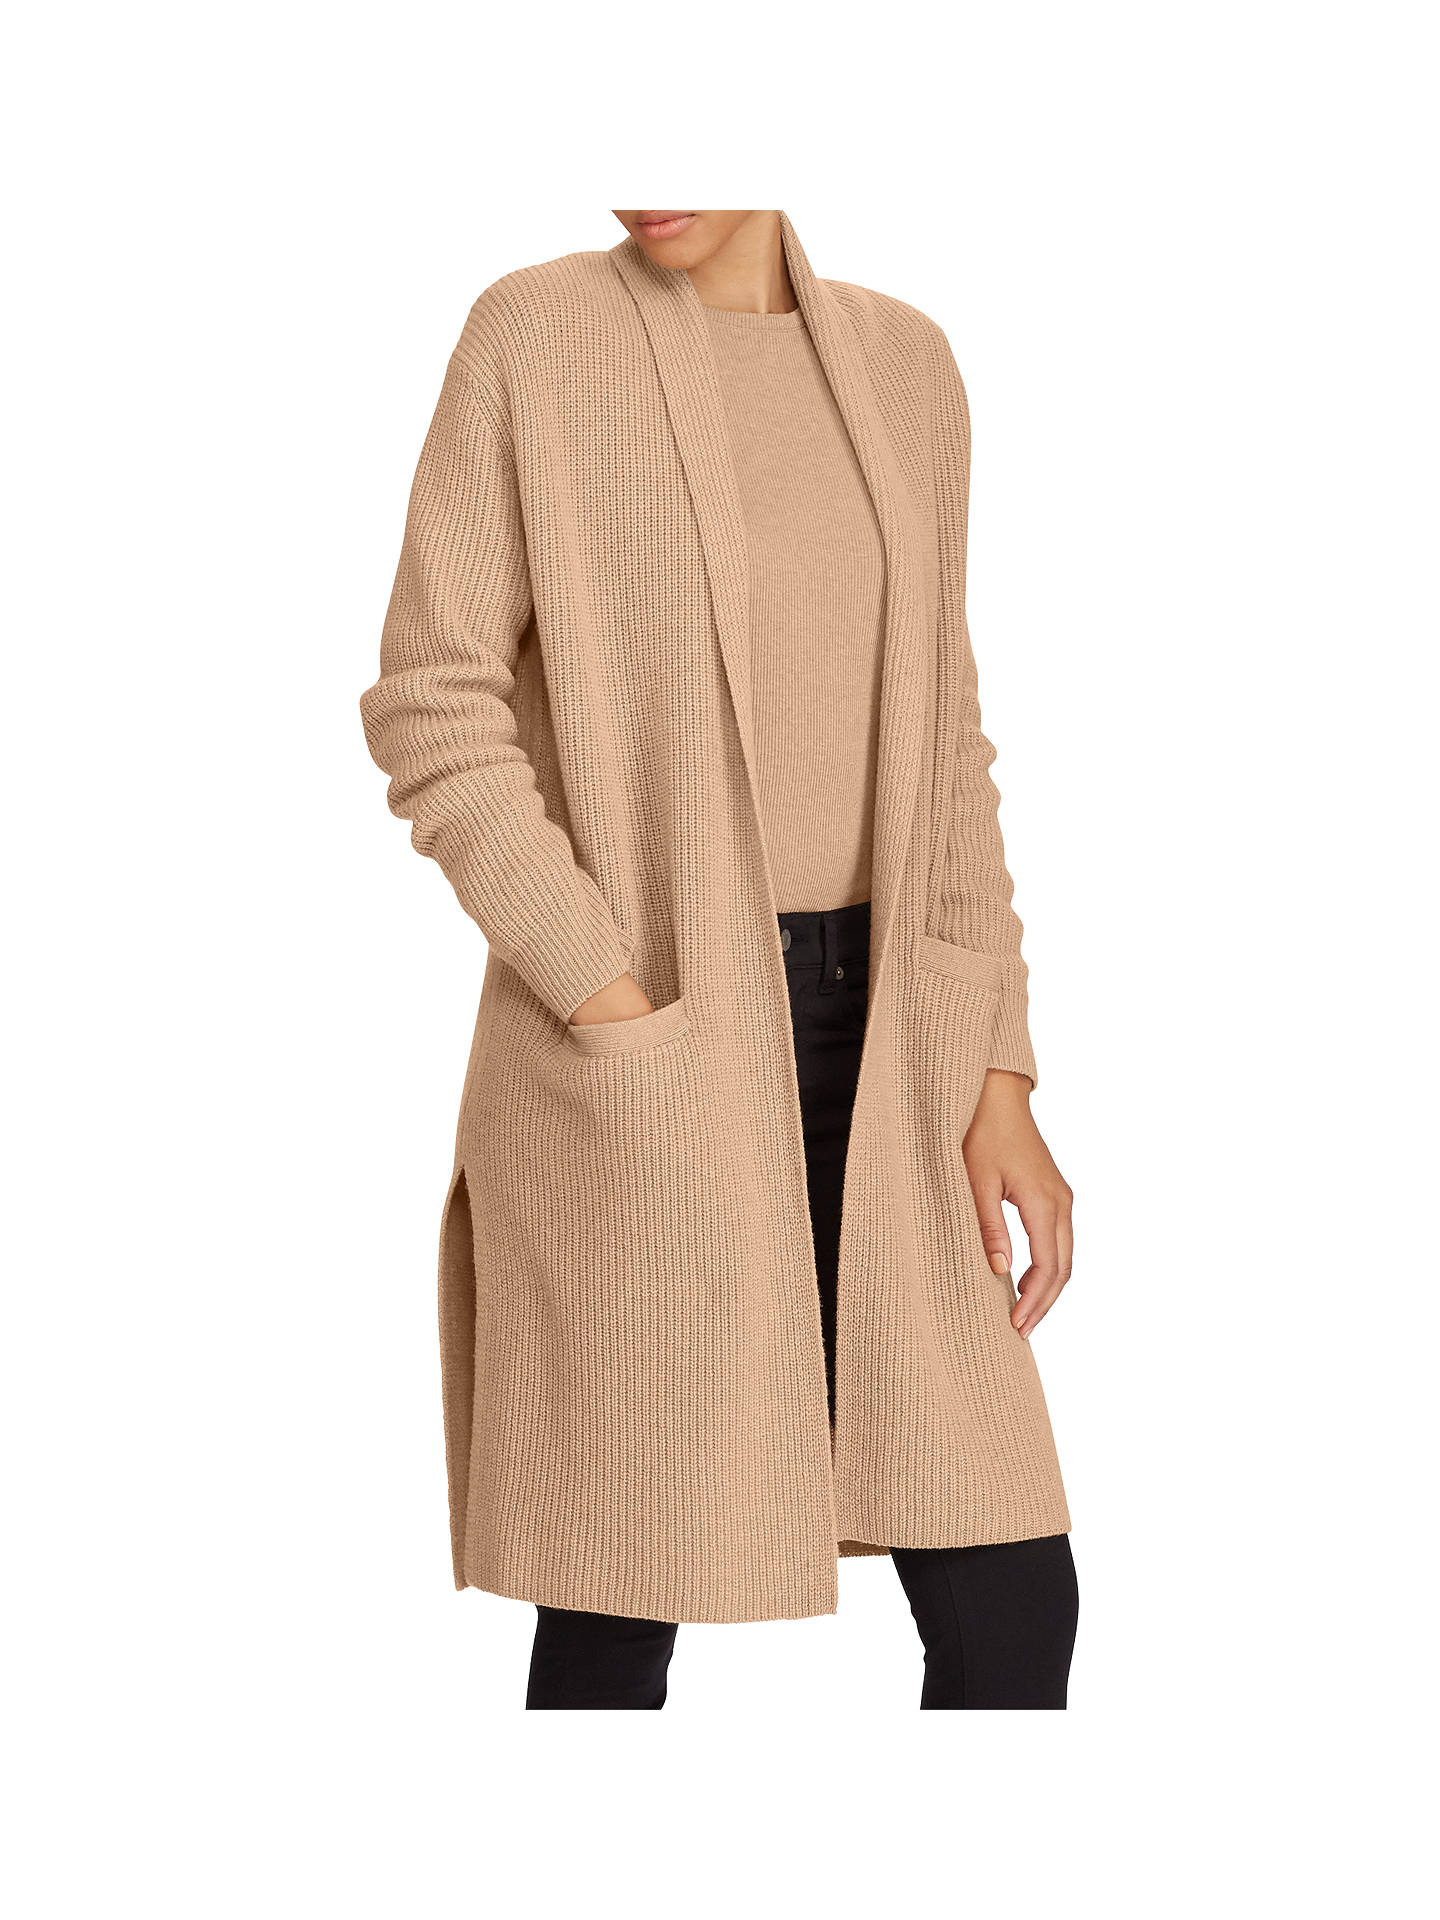 365eb4b11 View All Women s Knitwear. Buy Polo Ralph Lauren Cashmere Elongated Cardigan